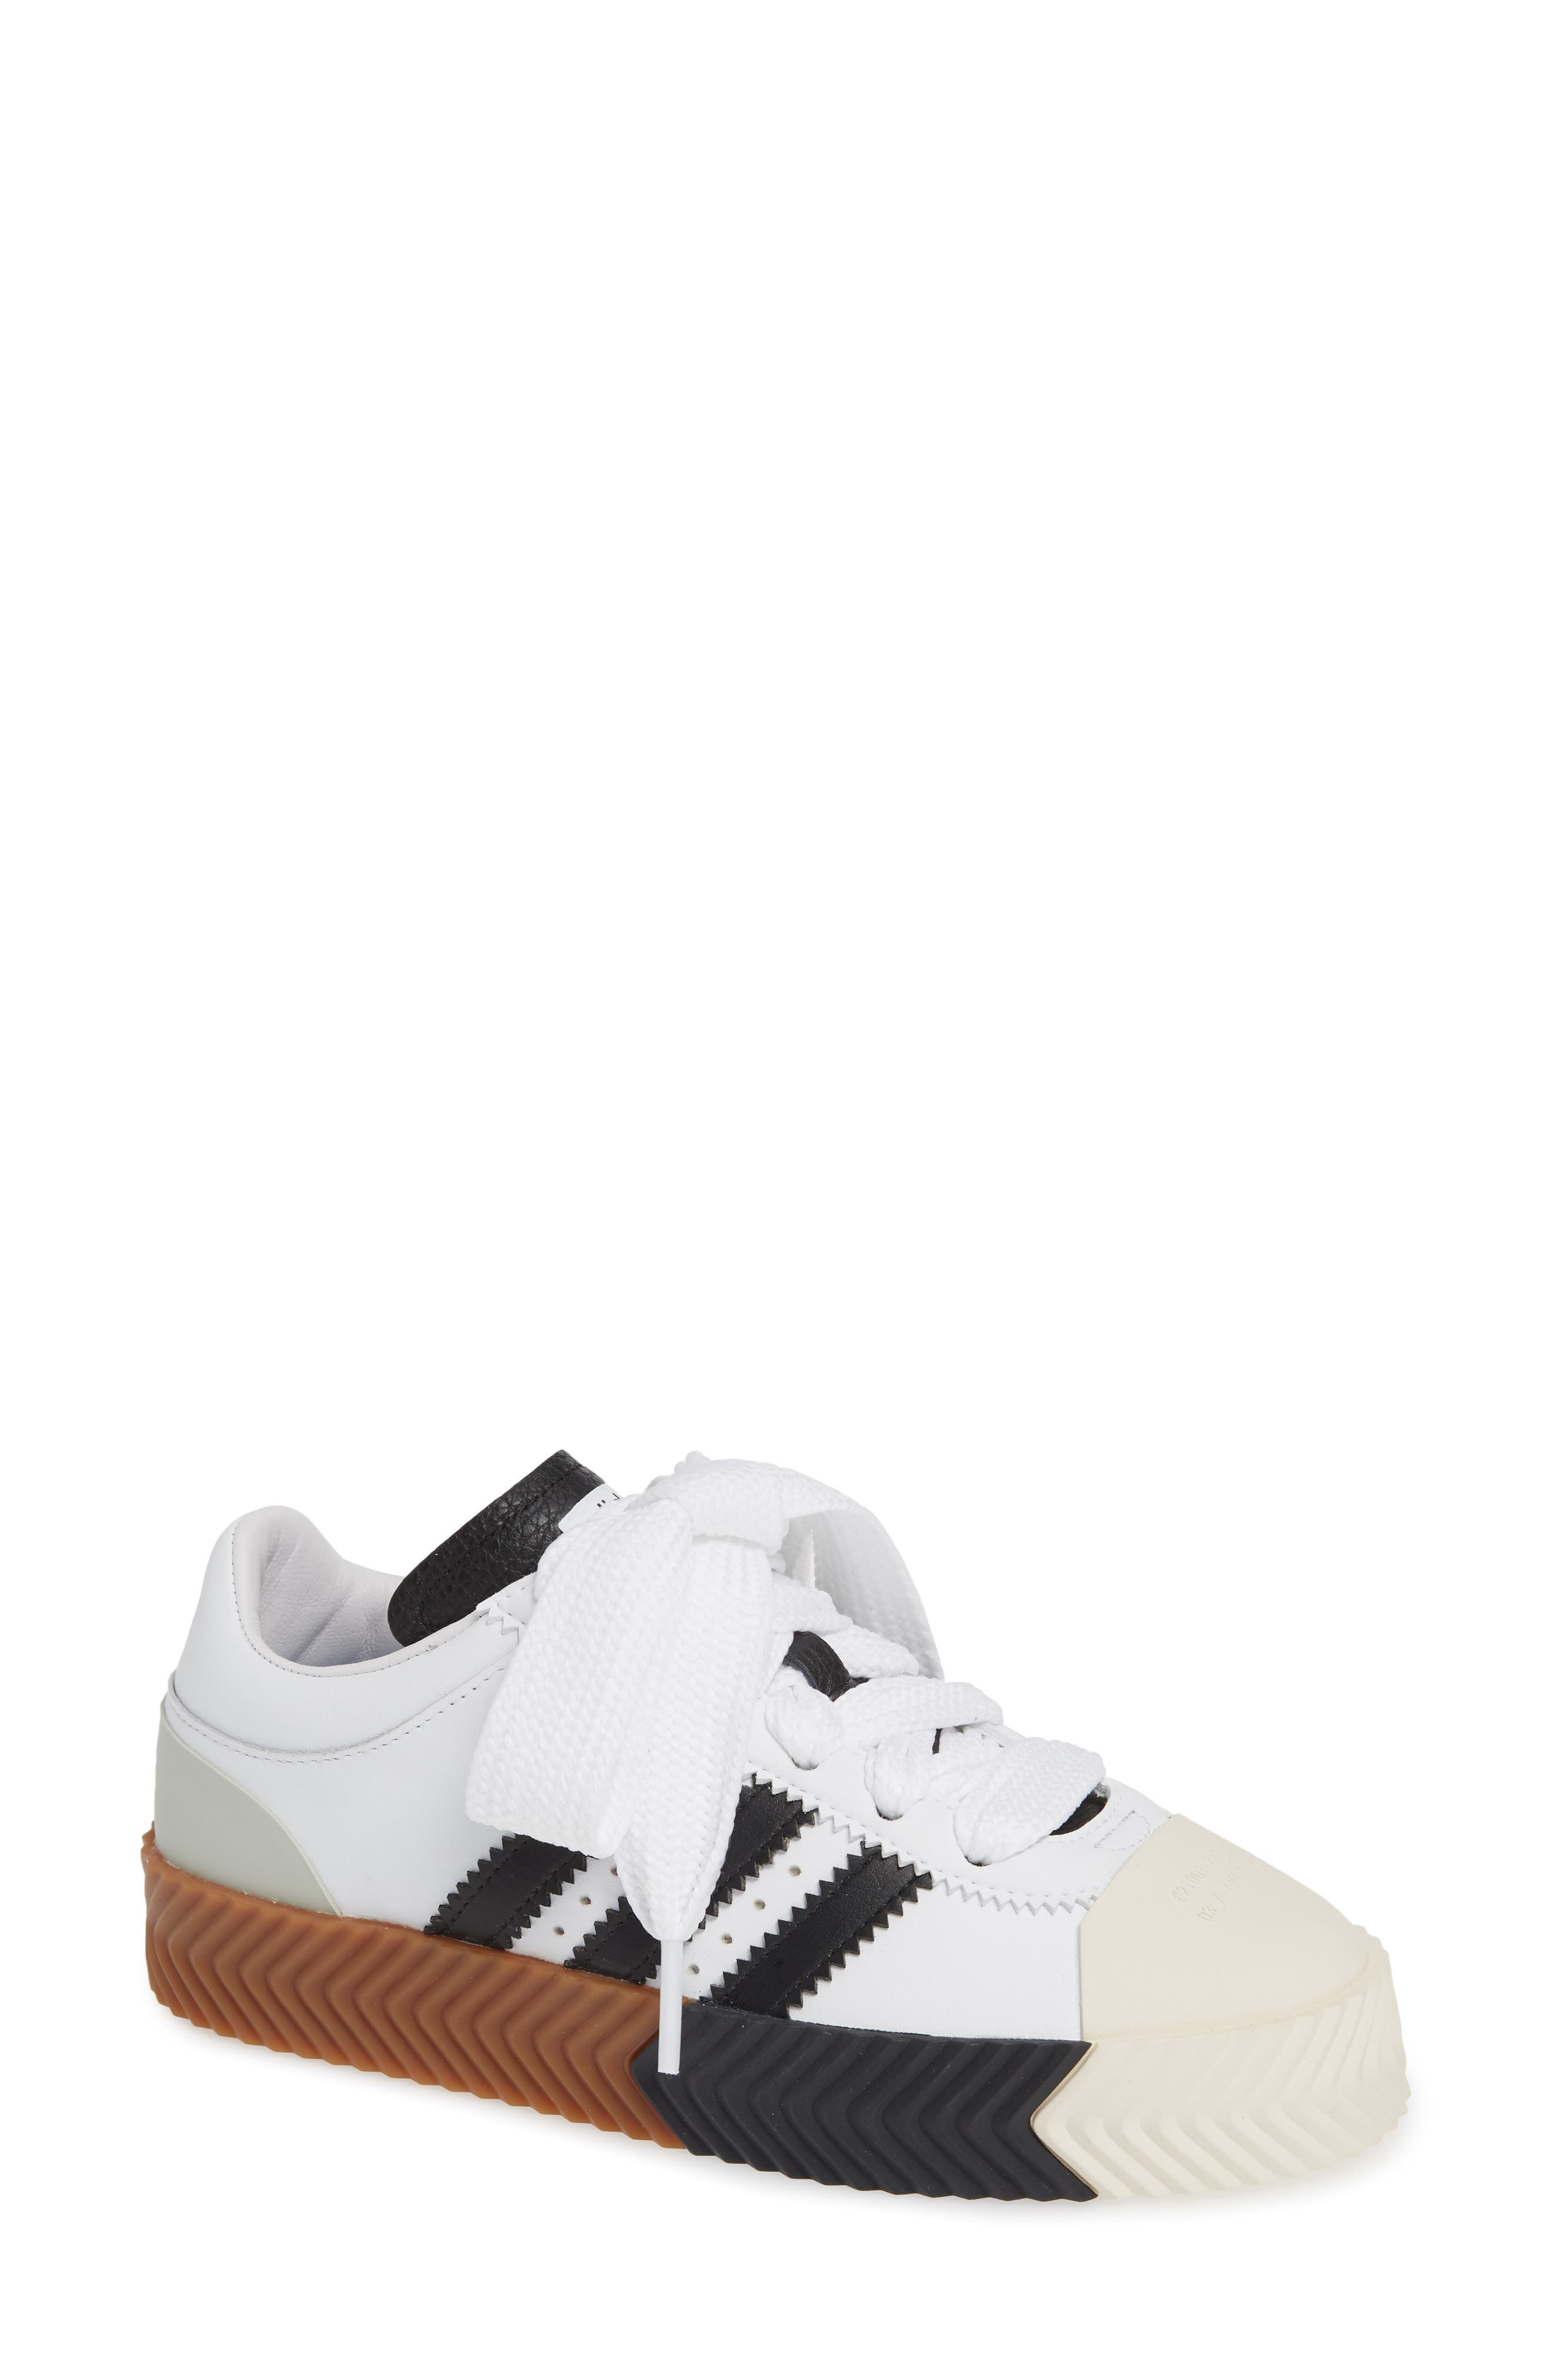 Skate Super Sneaker,                             Main thumbnail 1, color,                             WHITE/ BLACK/ BROWN